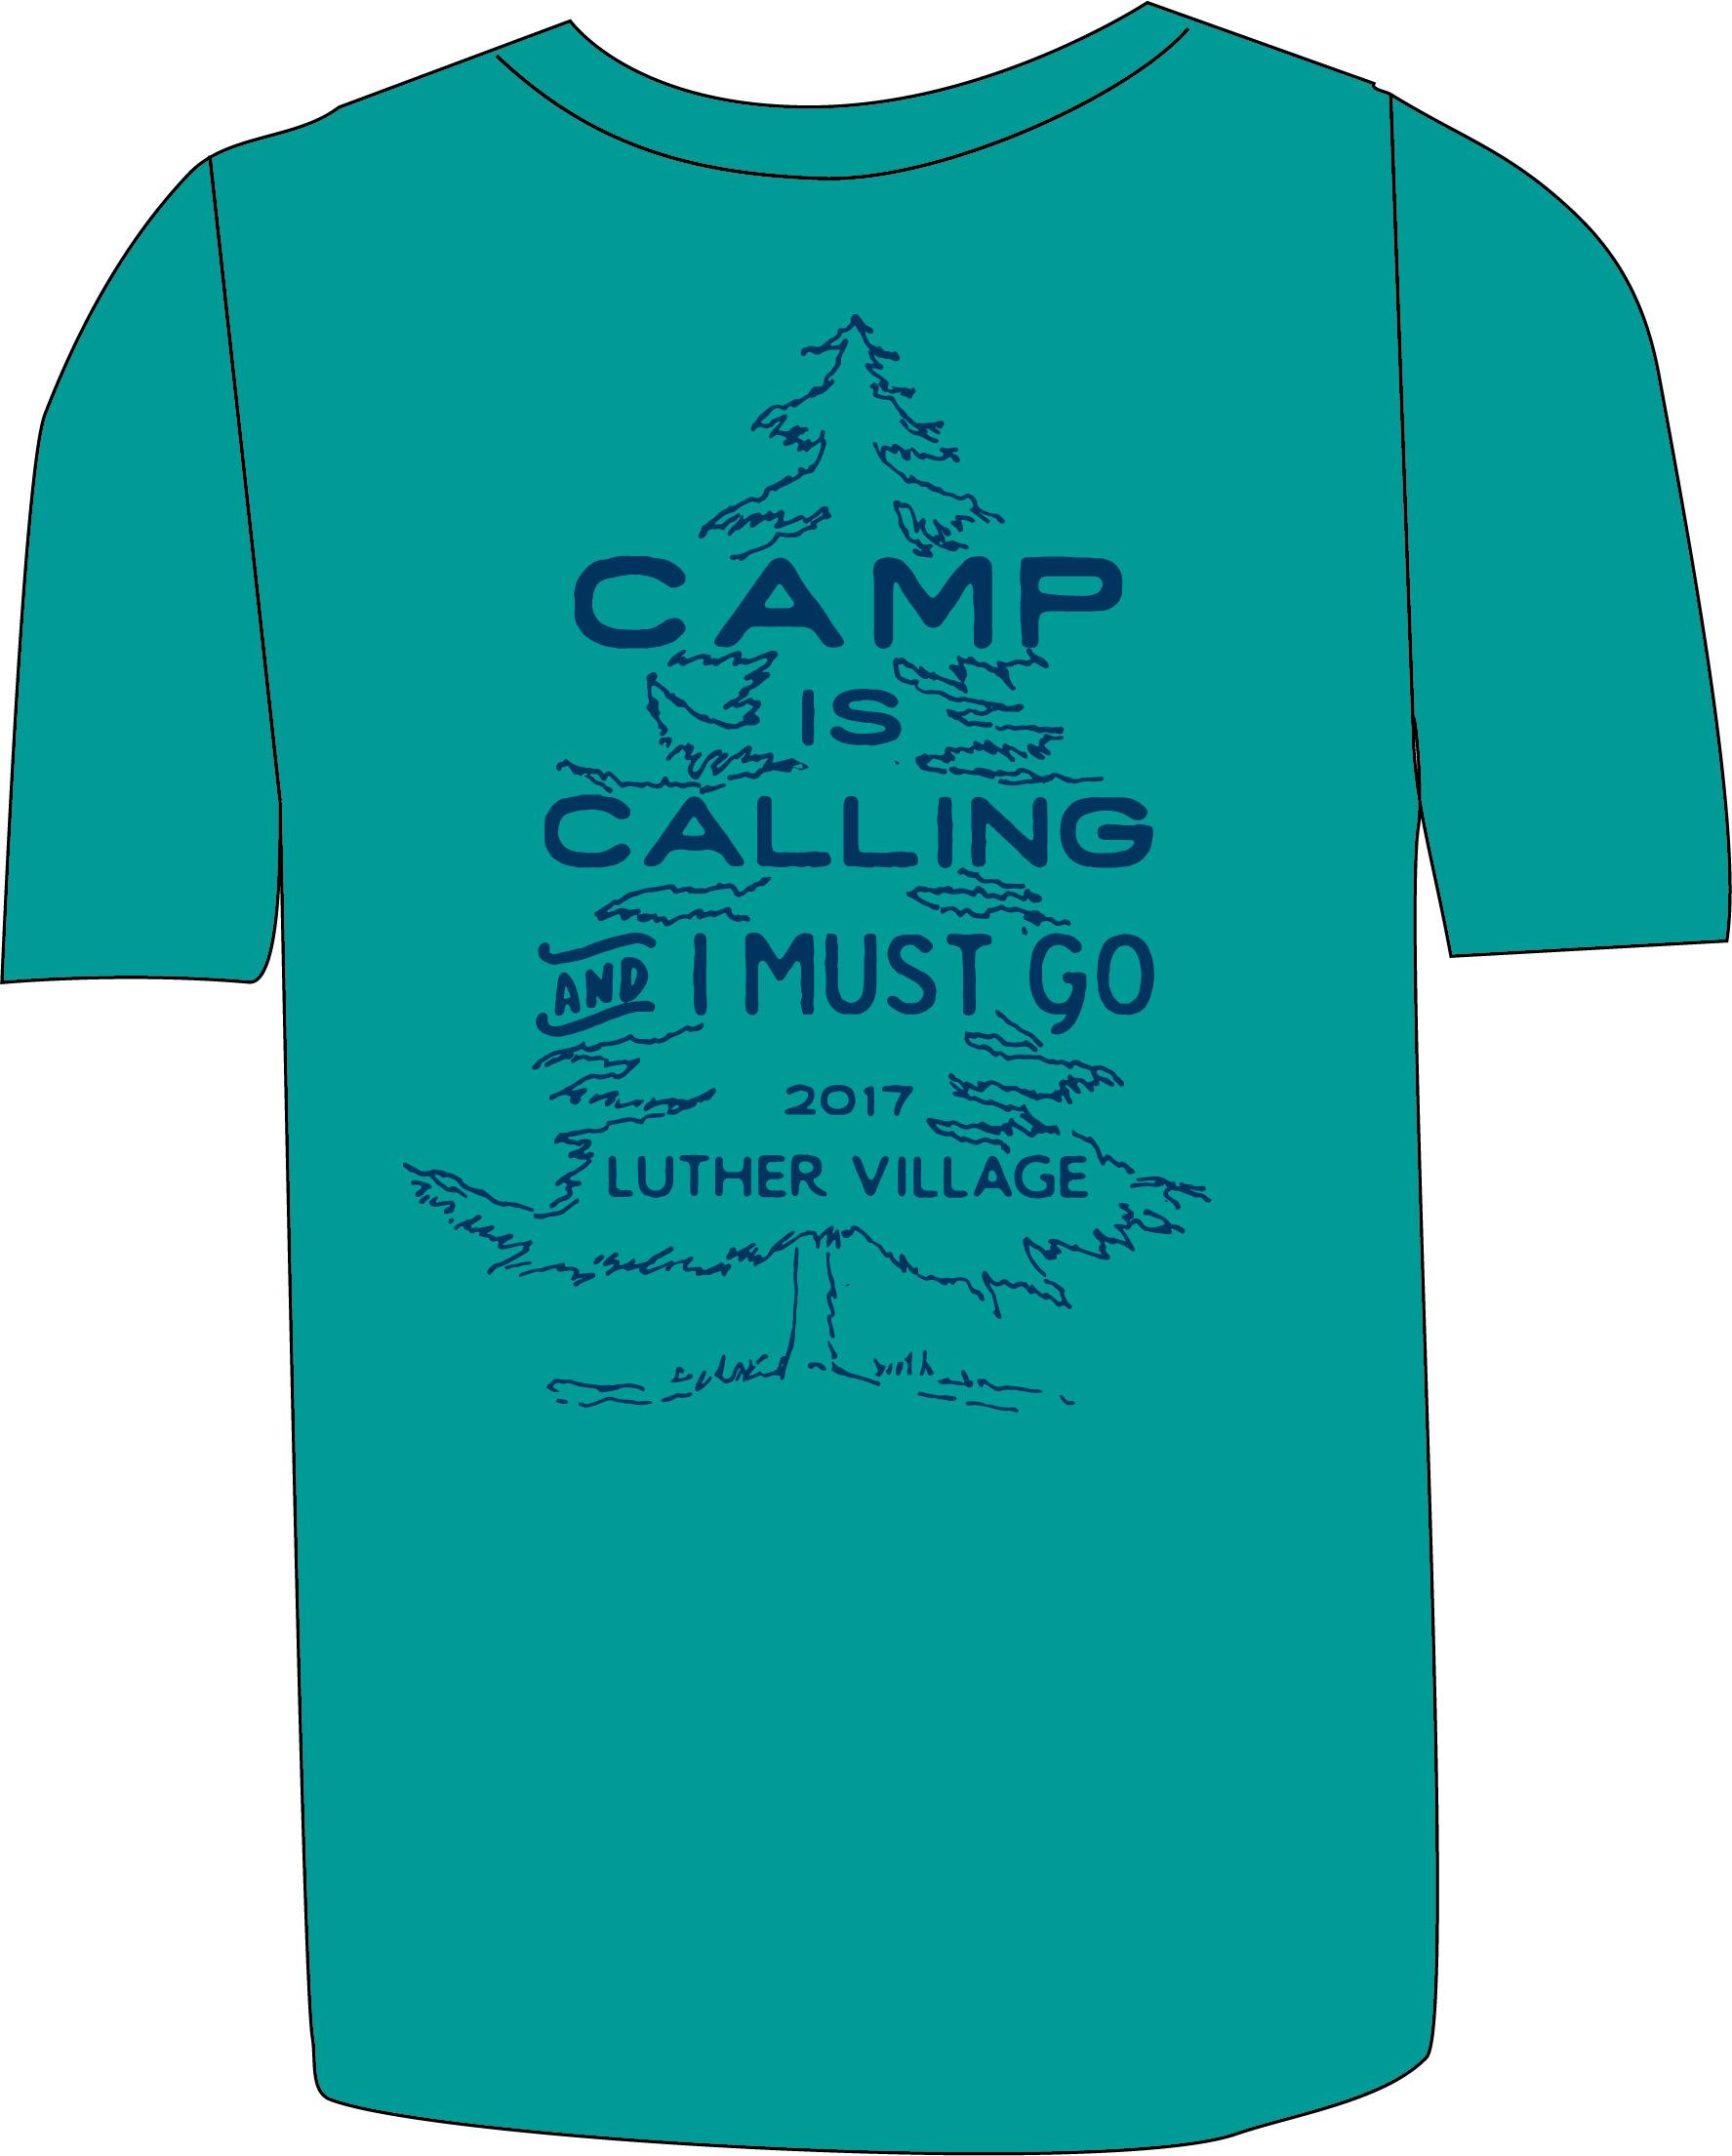 CampisCallingLV17_CustomTdesign.jpg